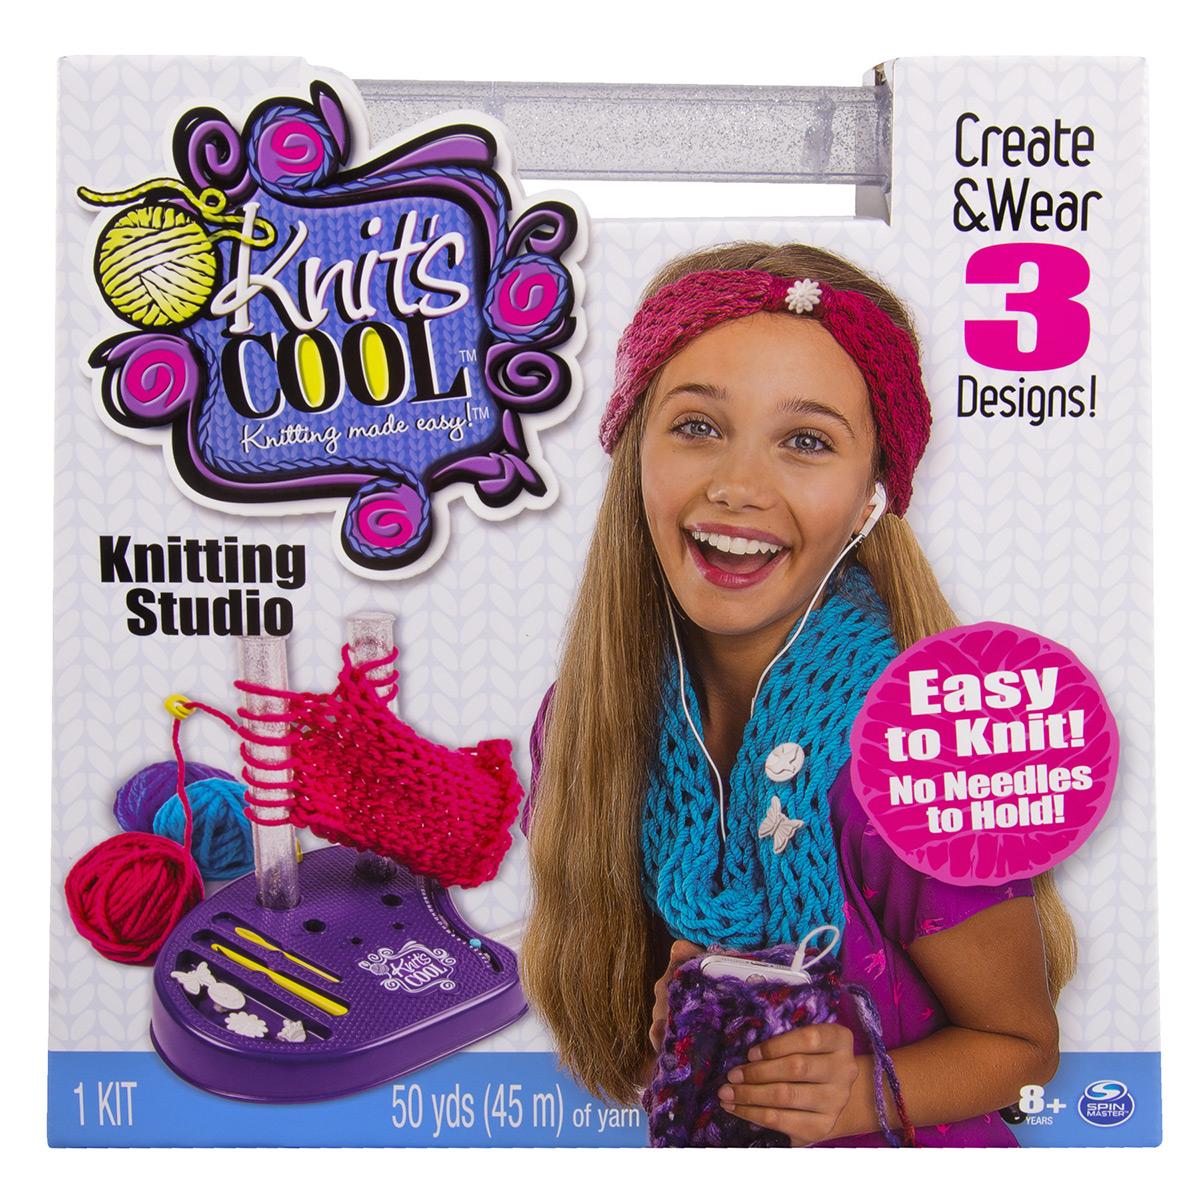 Knitting Kits Michaels : Knit s cool™ knitting studio